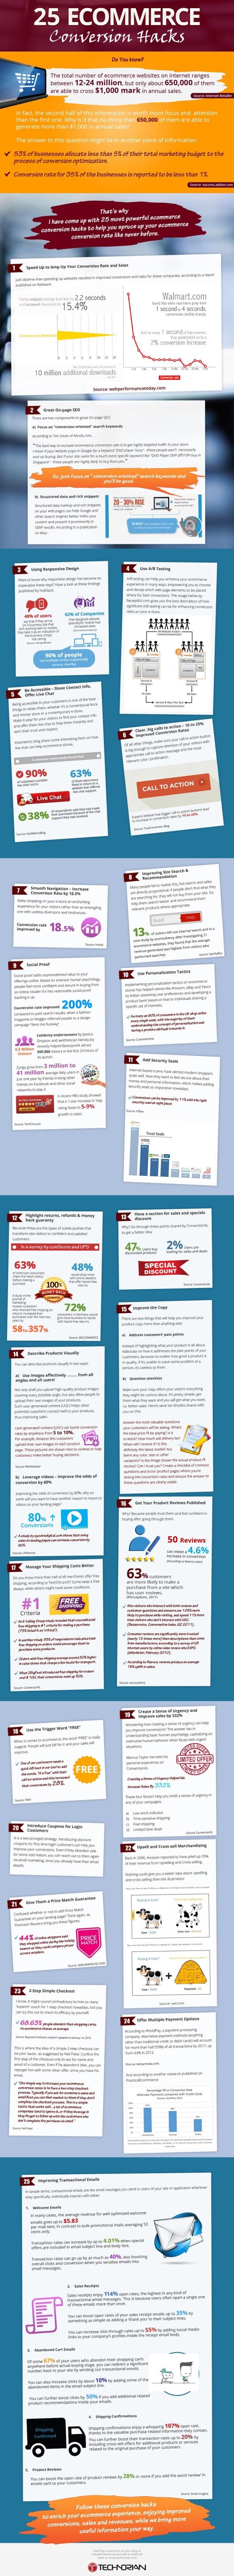 25-Ecommerce-Conversion-Optimization-Hacks-Infographic-image